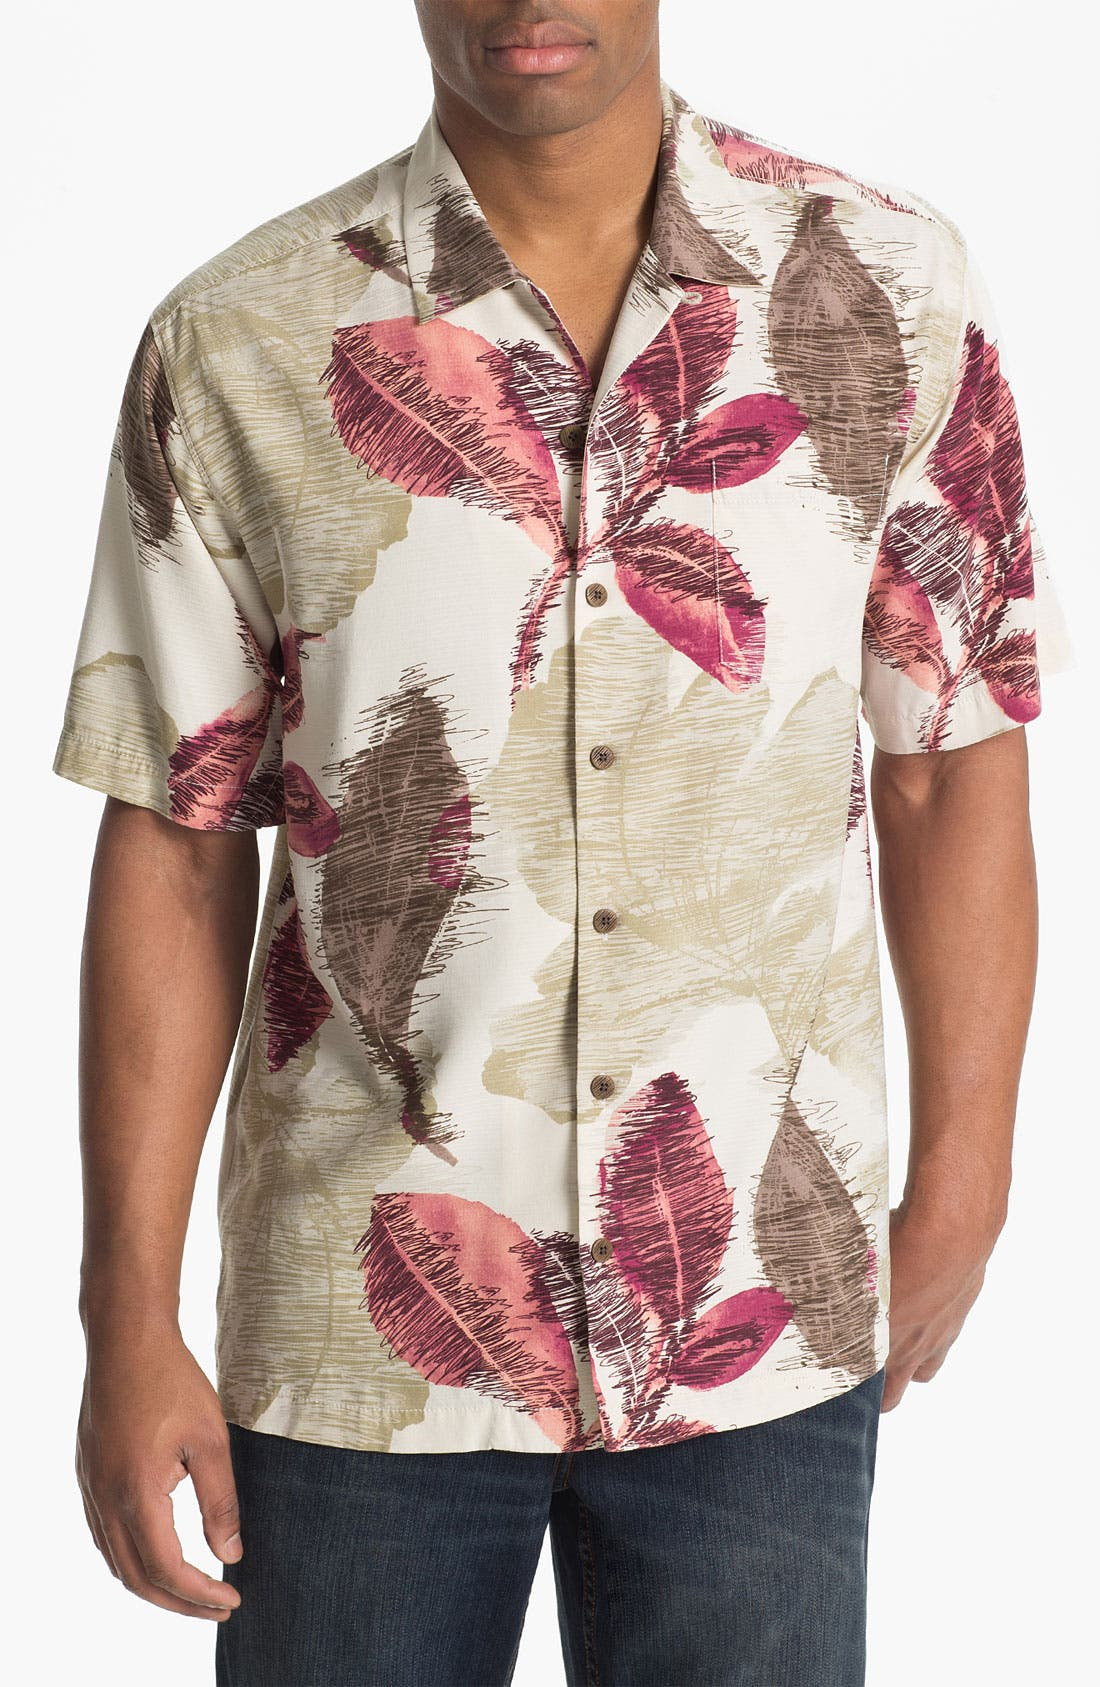 Main Image - Tommy Bahama 'Avant Garden' Campshirt